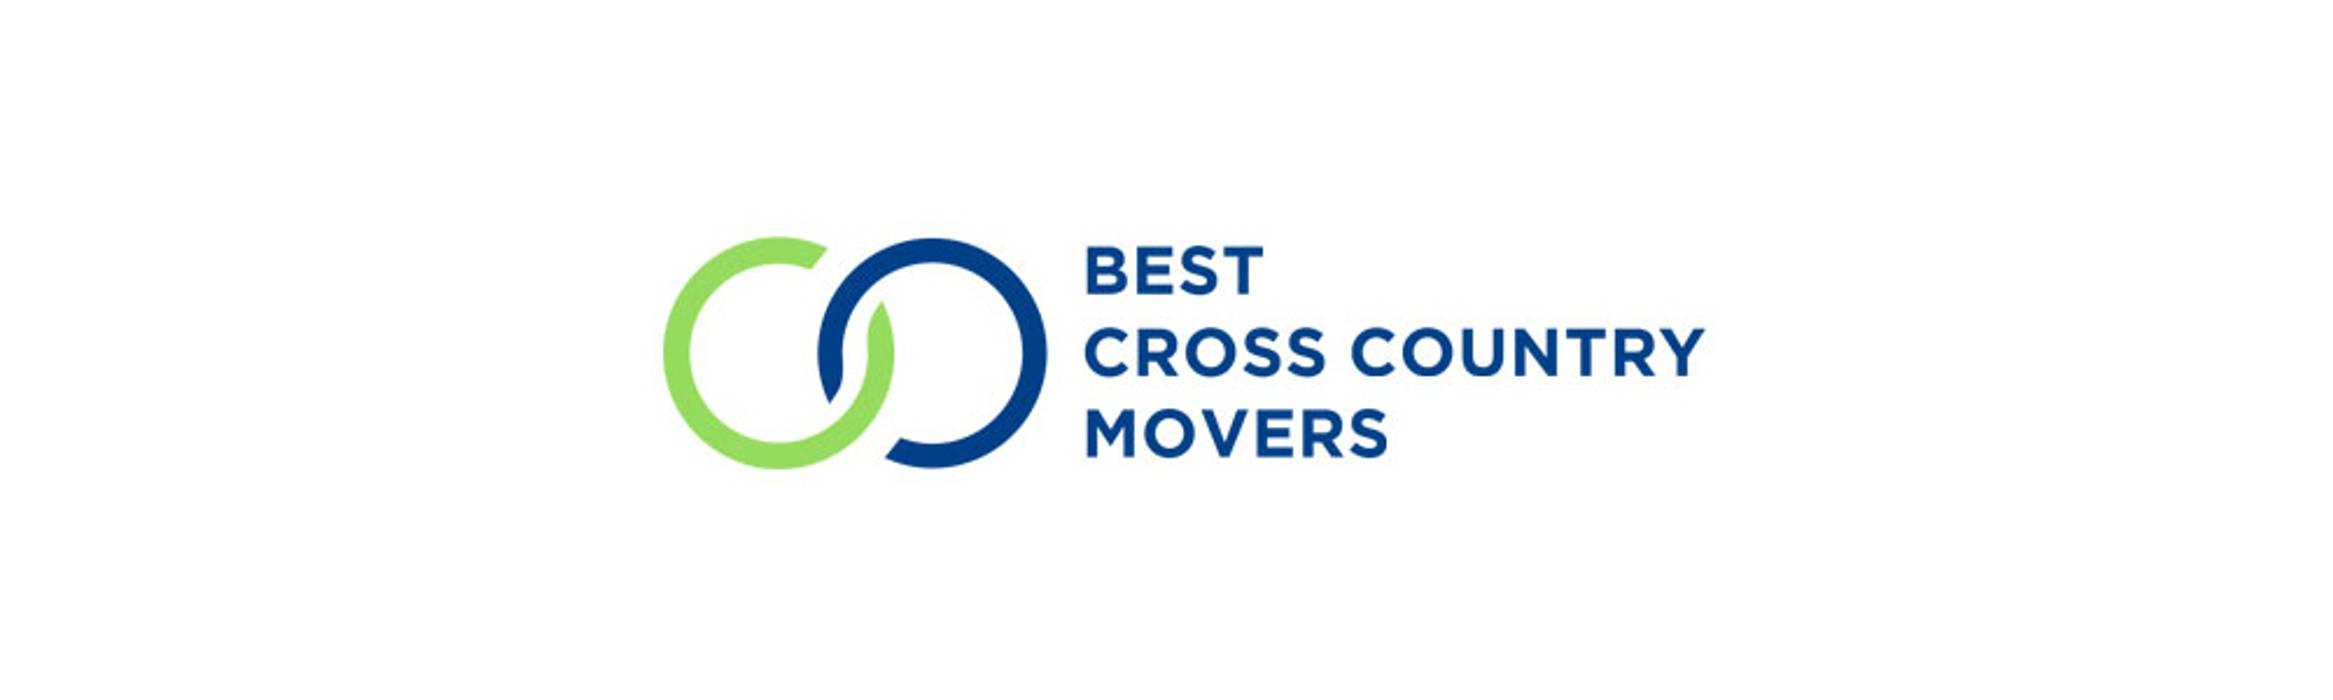 Best Cross Country Movers Best Cross Country Movers